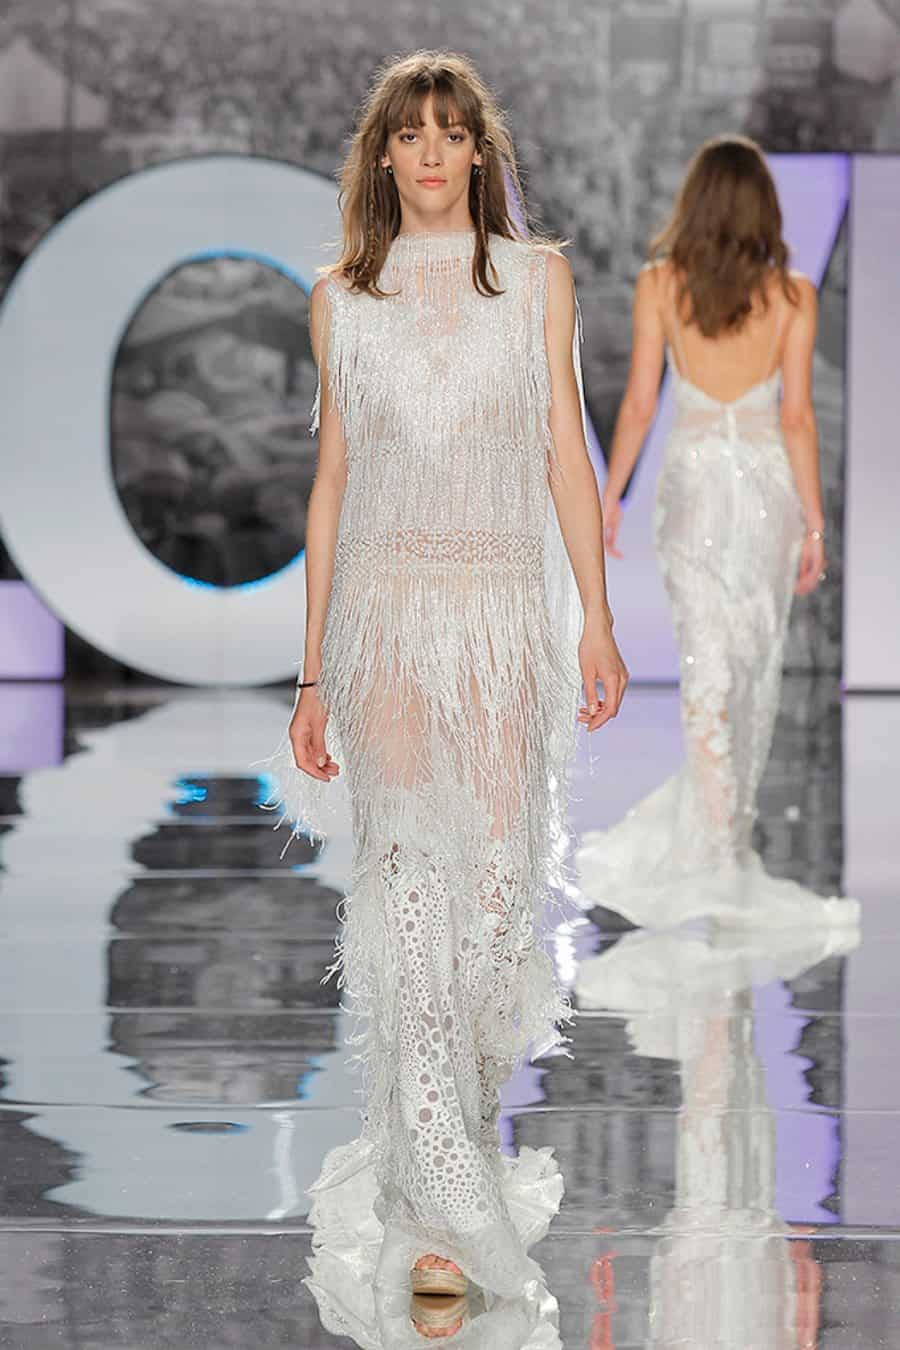 yolancris-weddingdress-bride-boho-chic-folk-wedding-dress-couture-fashion-desing-bohodress-22